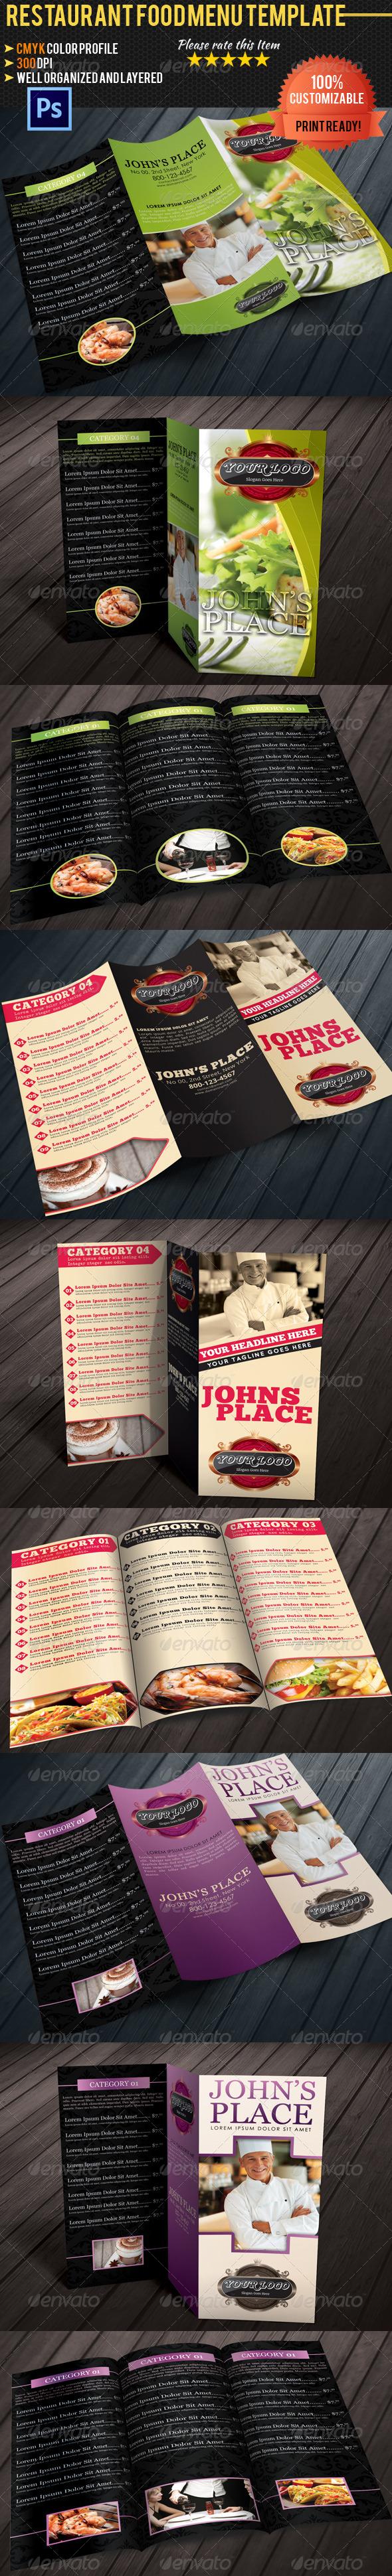 GraphicRiver Tri-fold Restaurant Food Menu Template Bundle 02 5100827